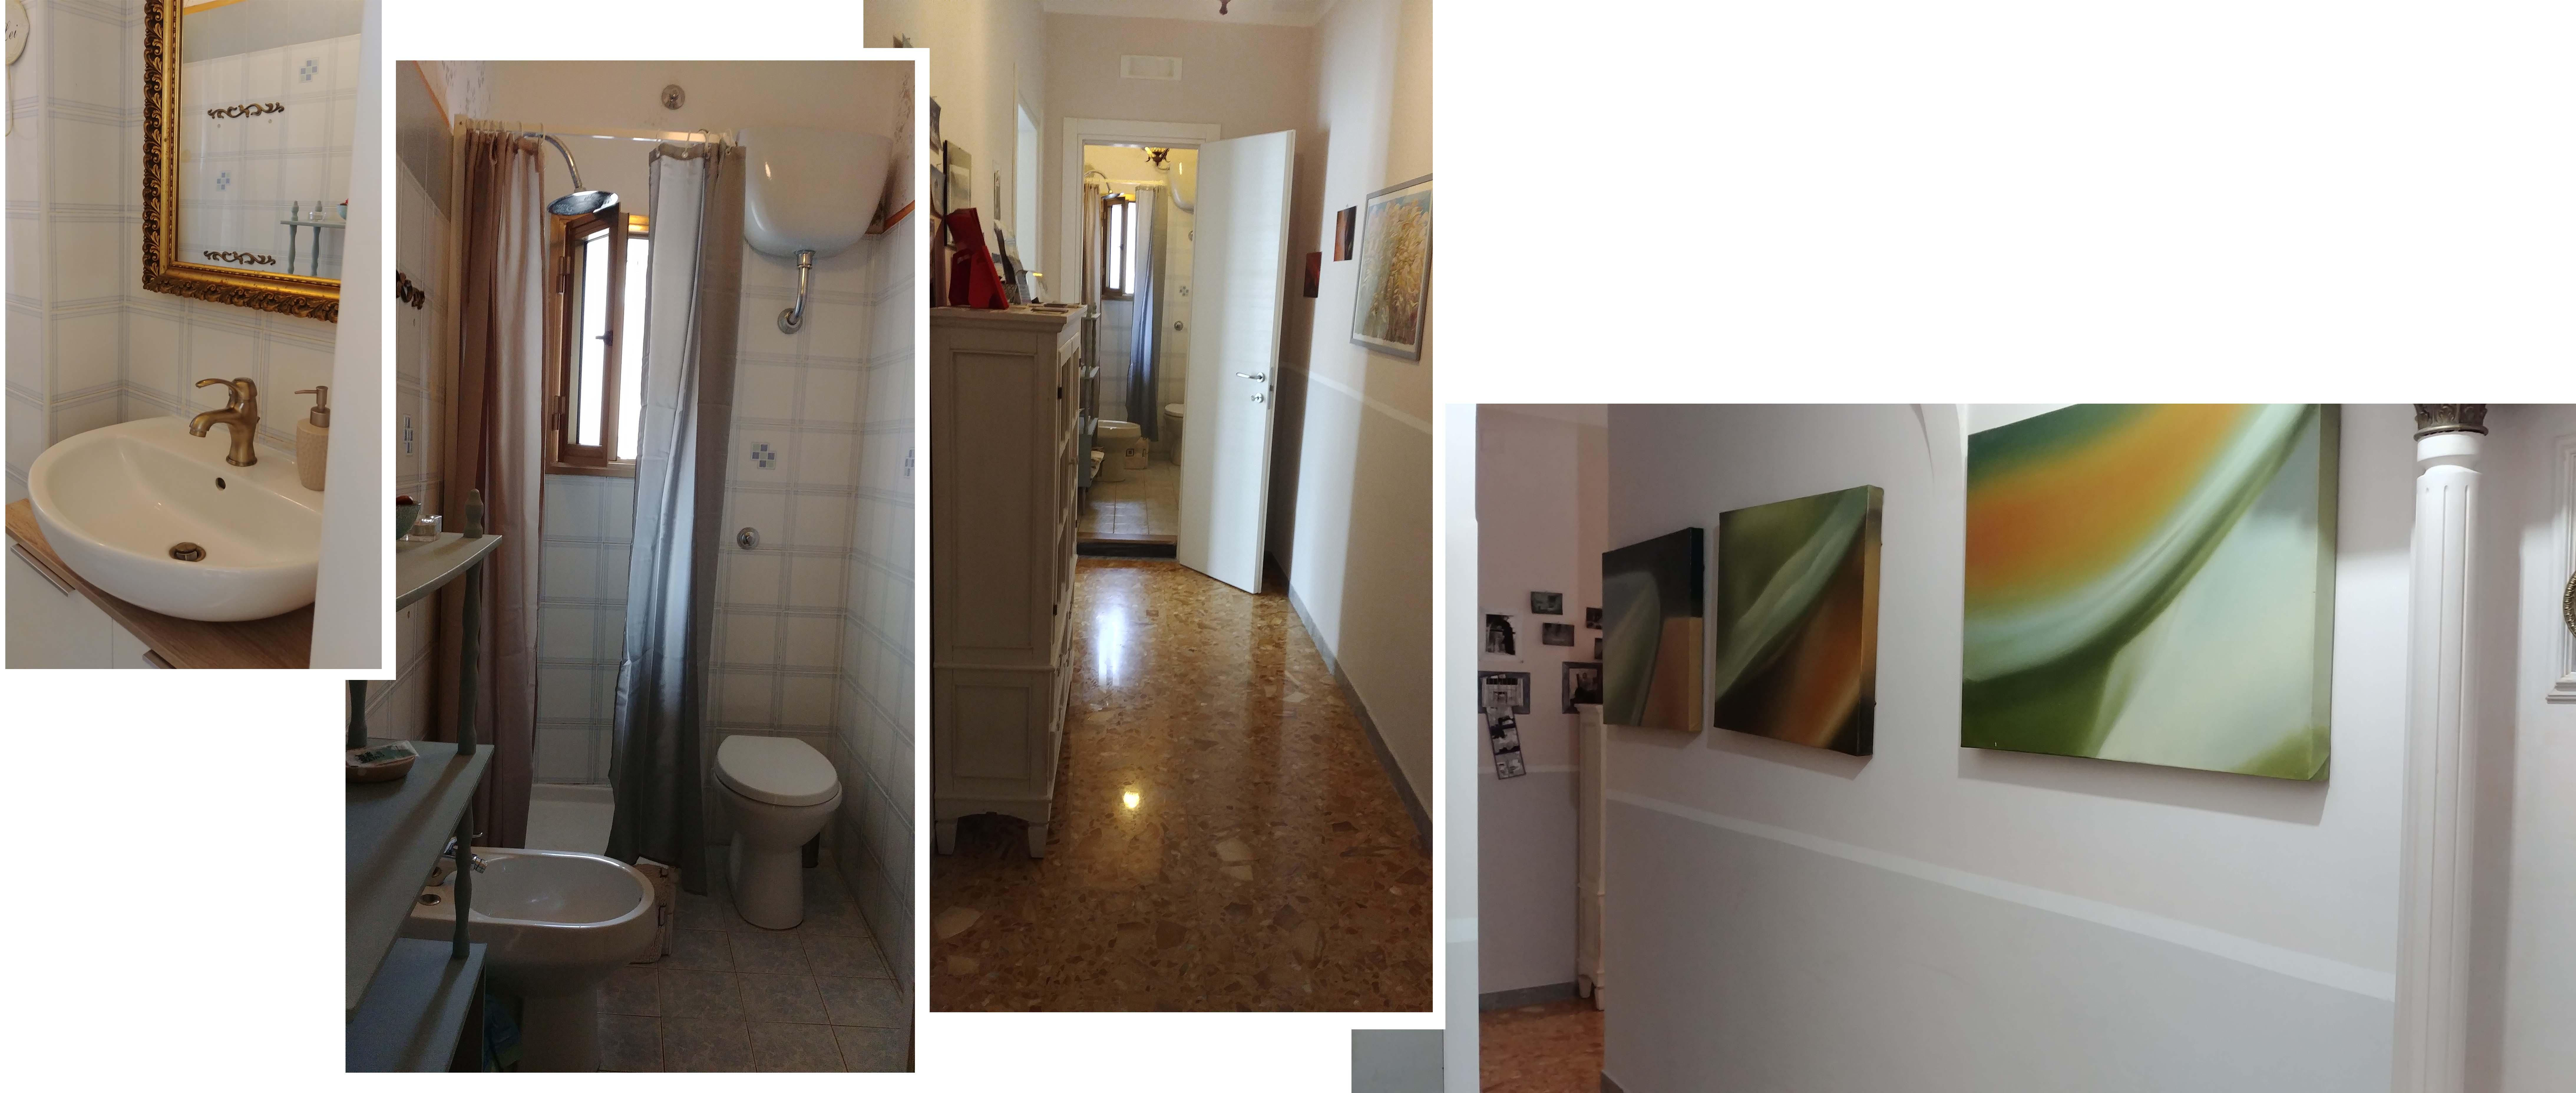 Bathroom and corridors